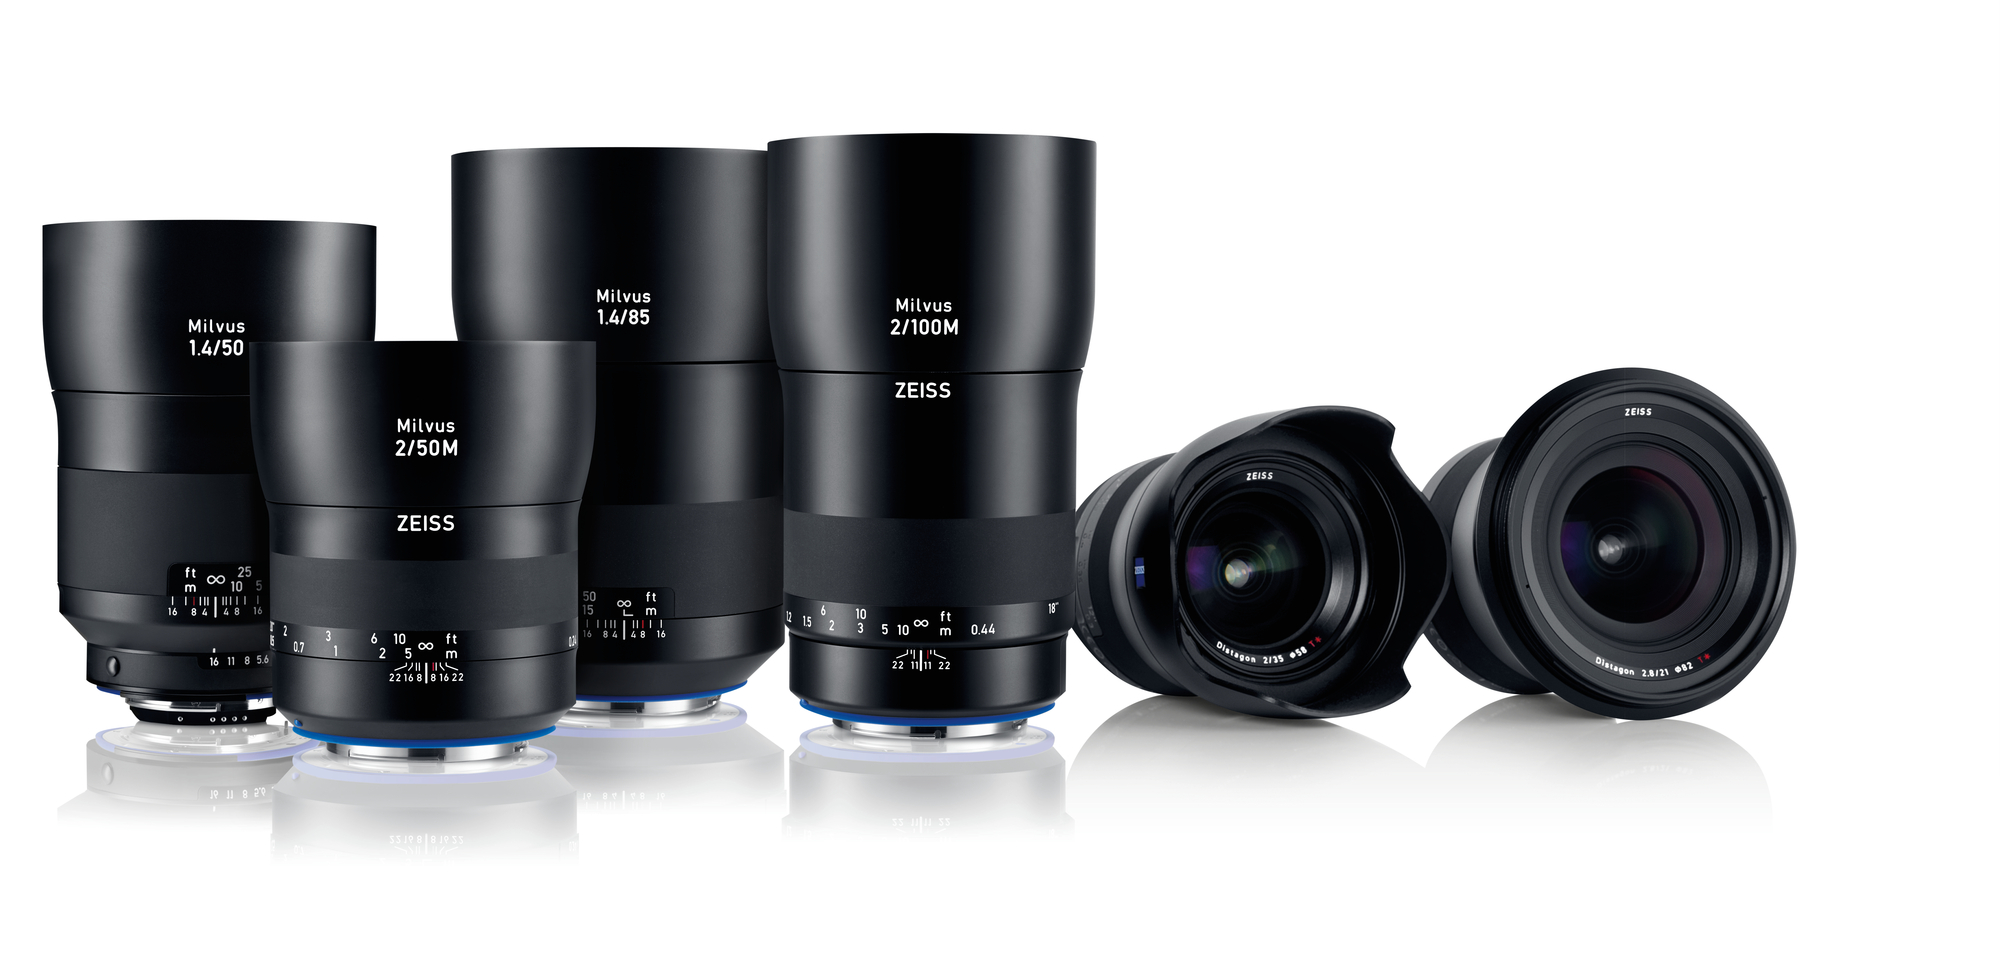 The new Milvus lens family from Zeiss.